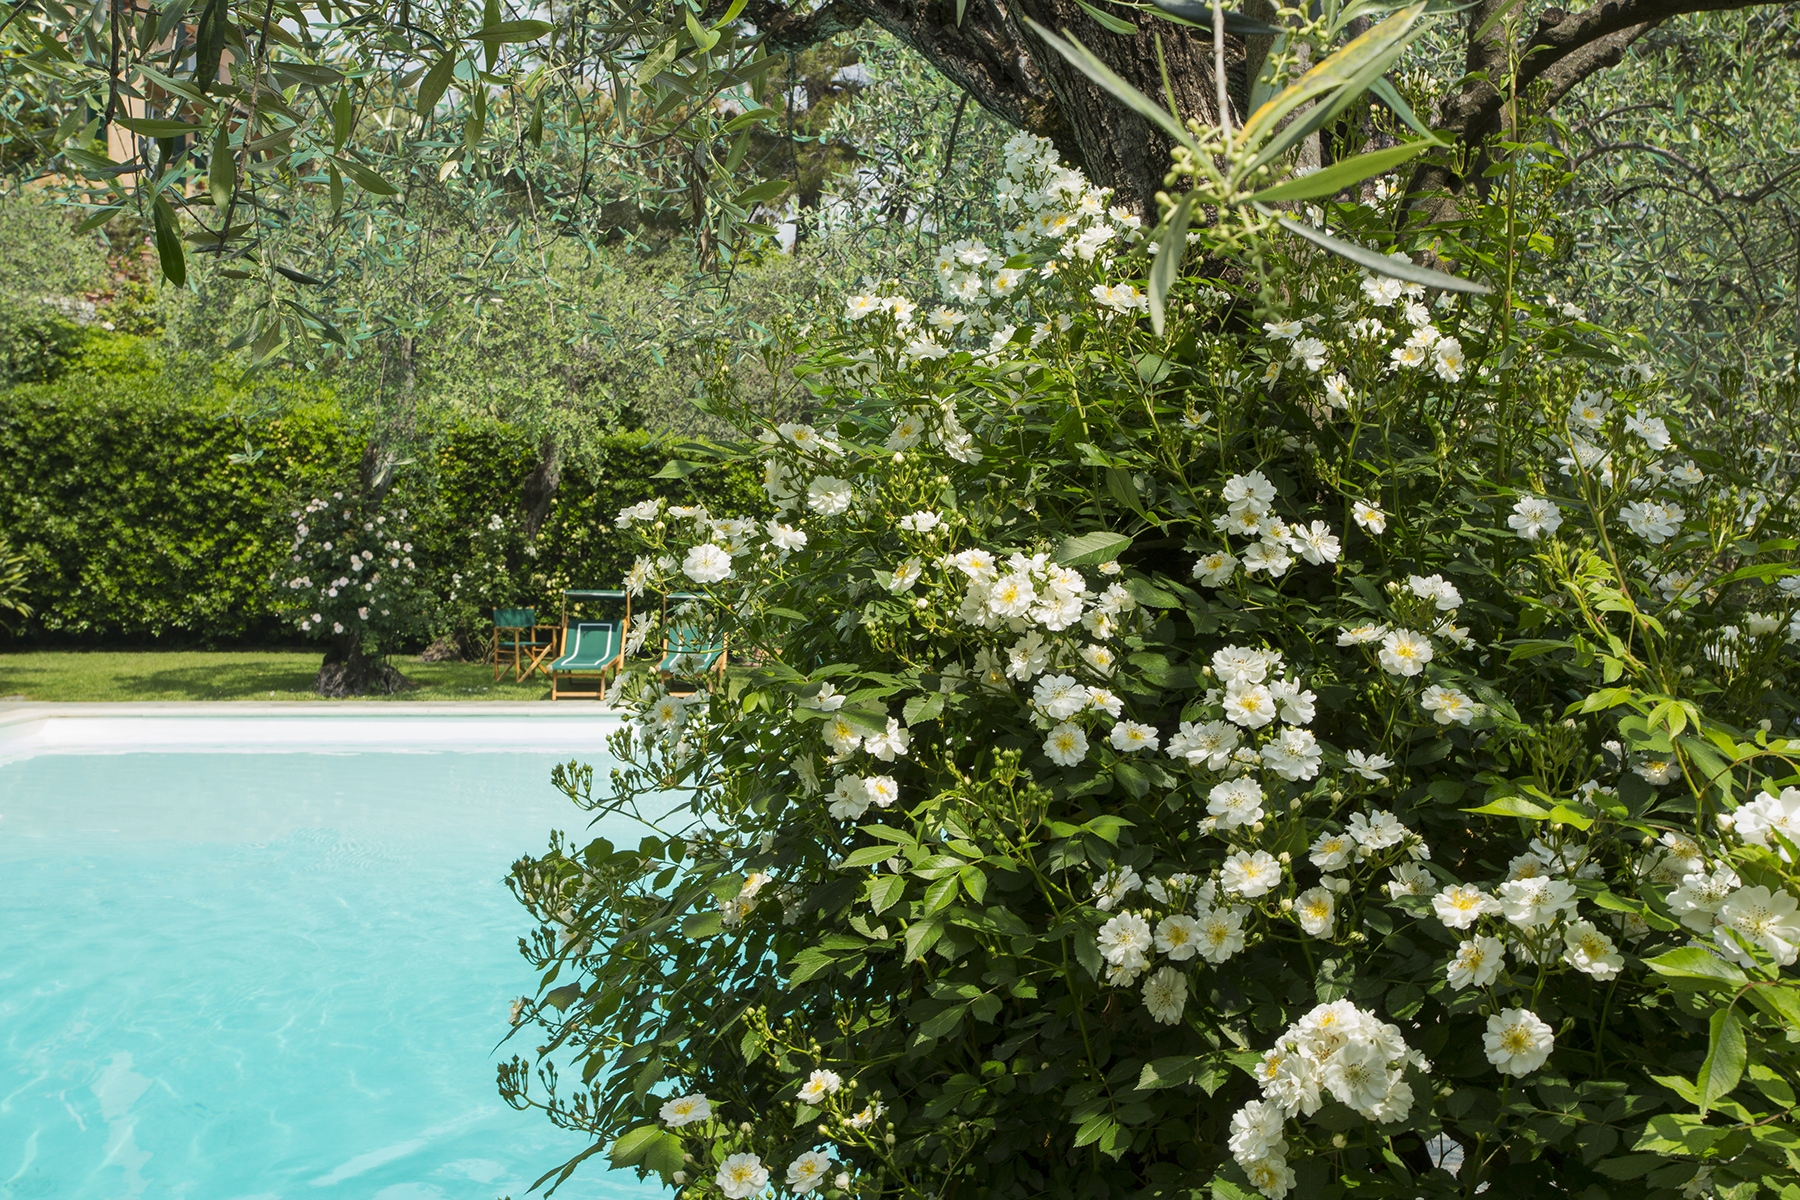 Villa in Vendita a Santa Margherita Ligure: 5 locali, 580 mq - Foto 28